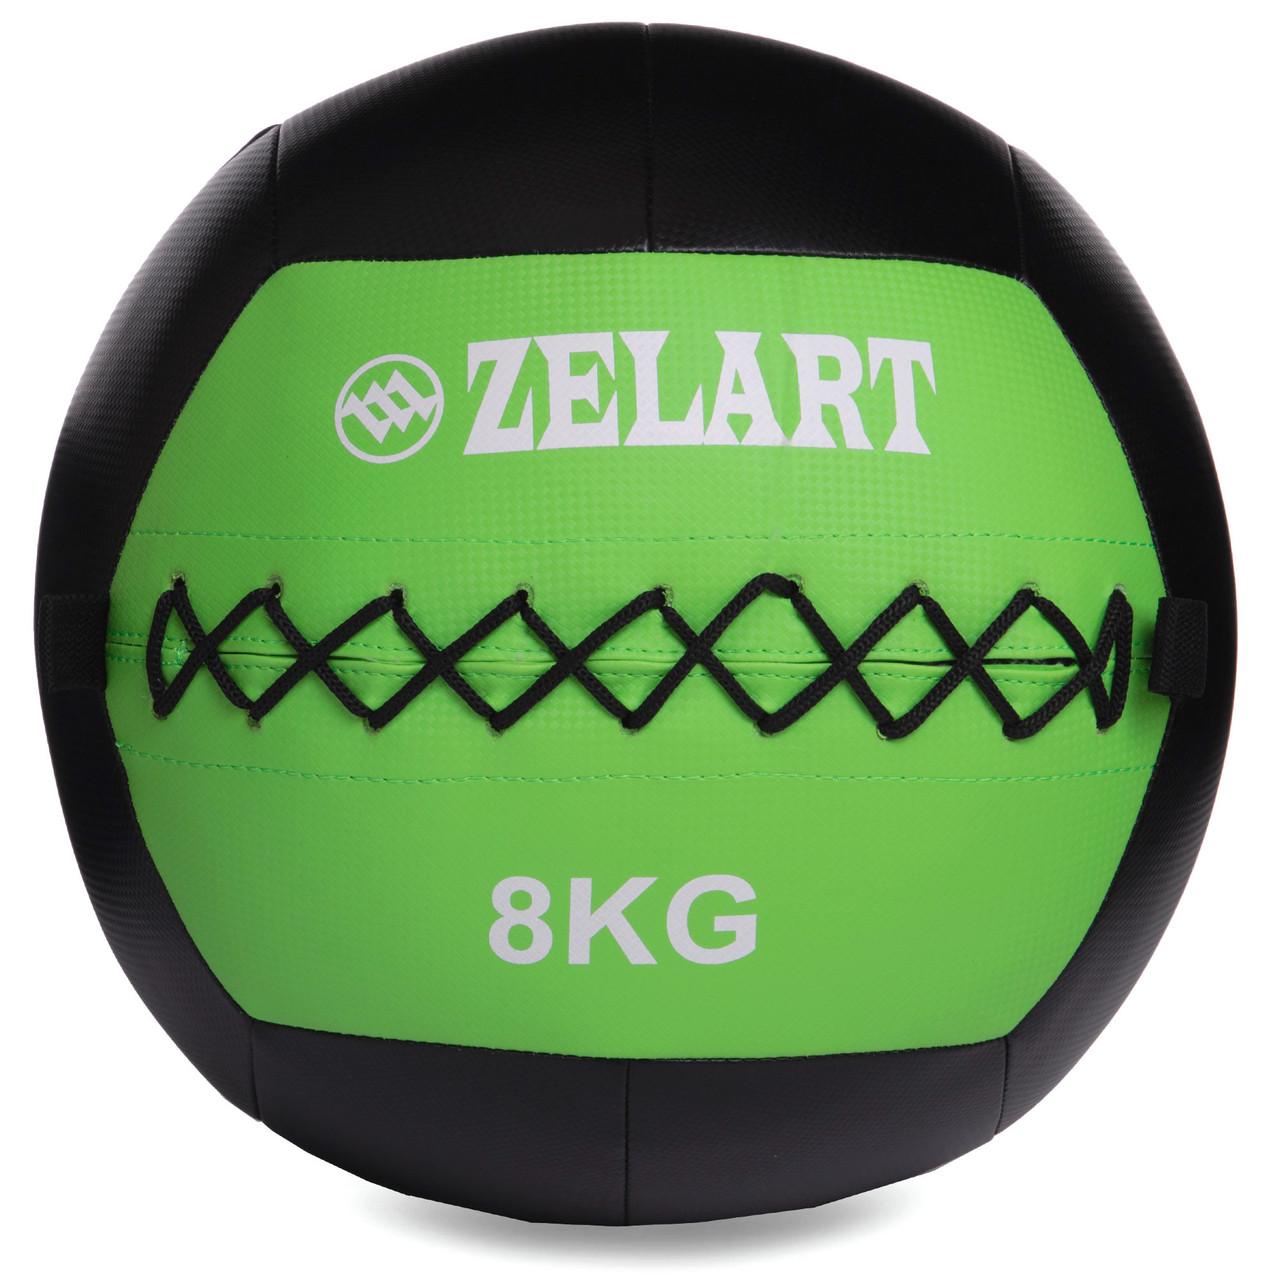 Мяч волбол для кроссфита и фитнеса 8кг Zelart WALL BALL FI-5168-8